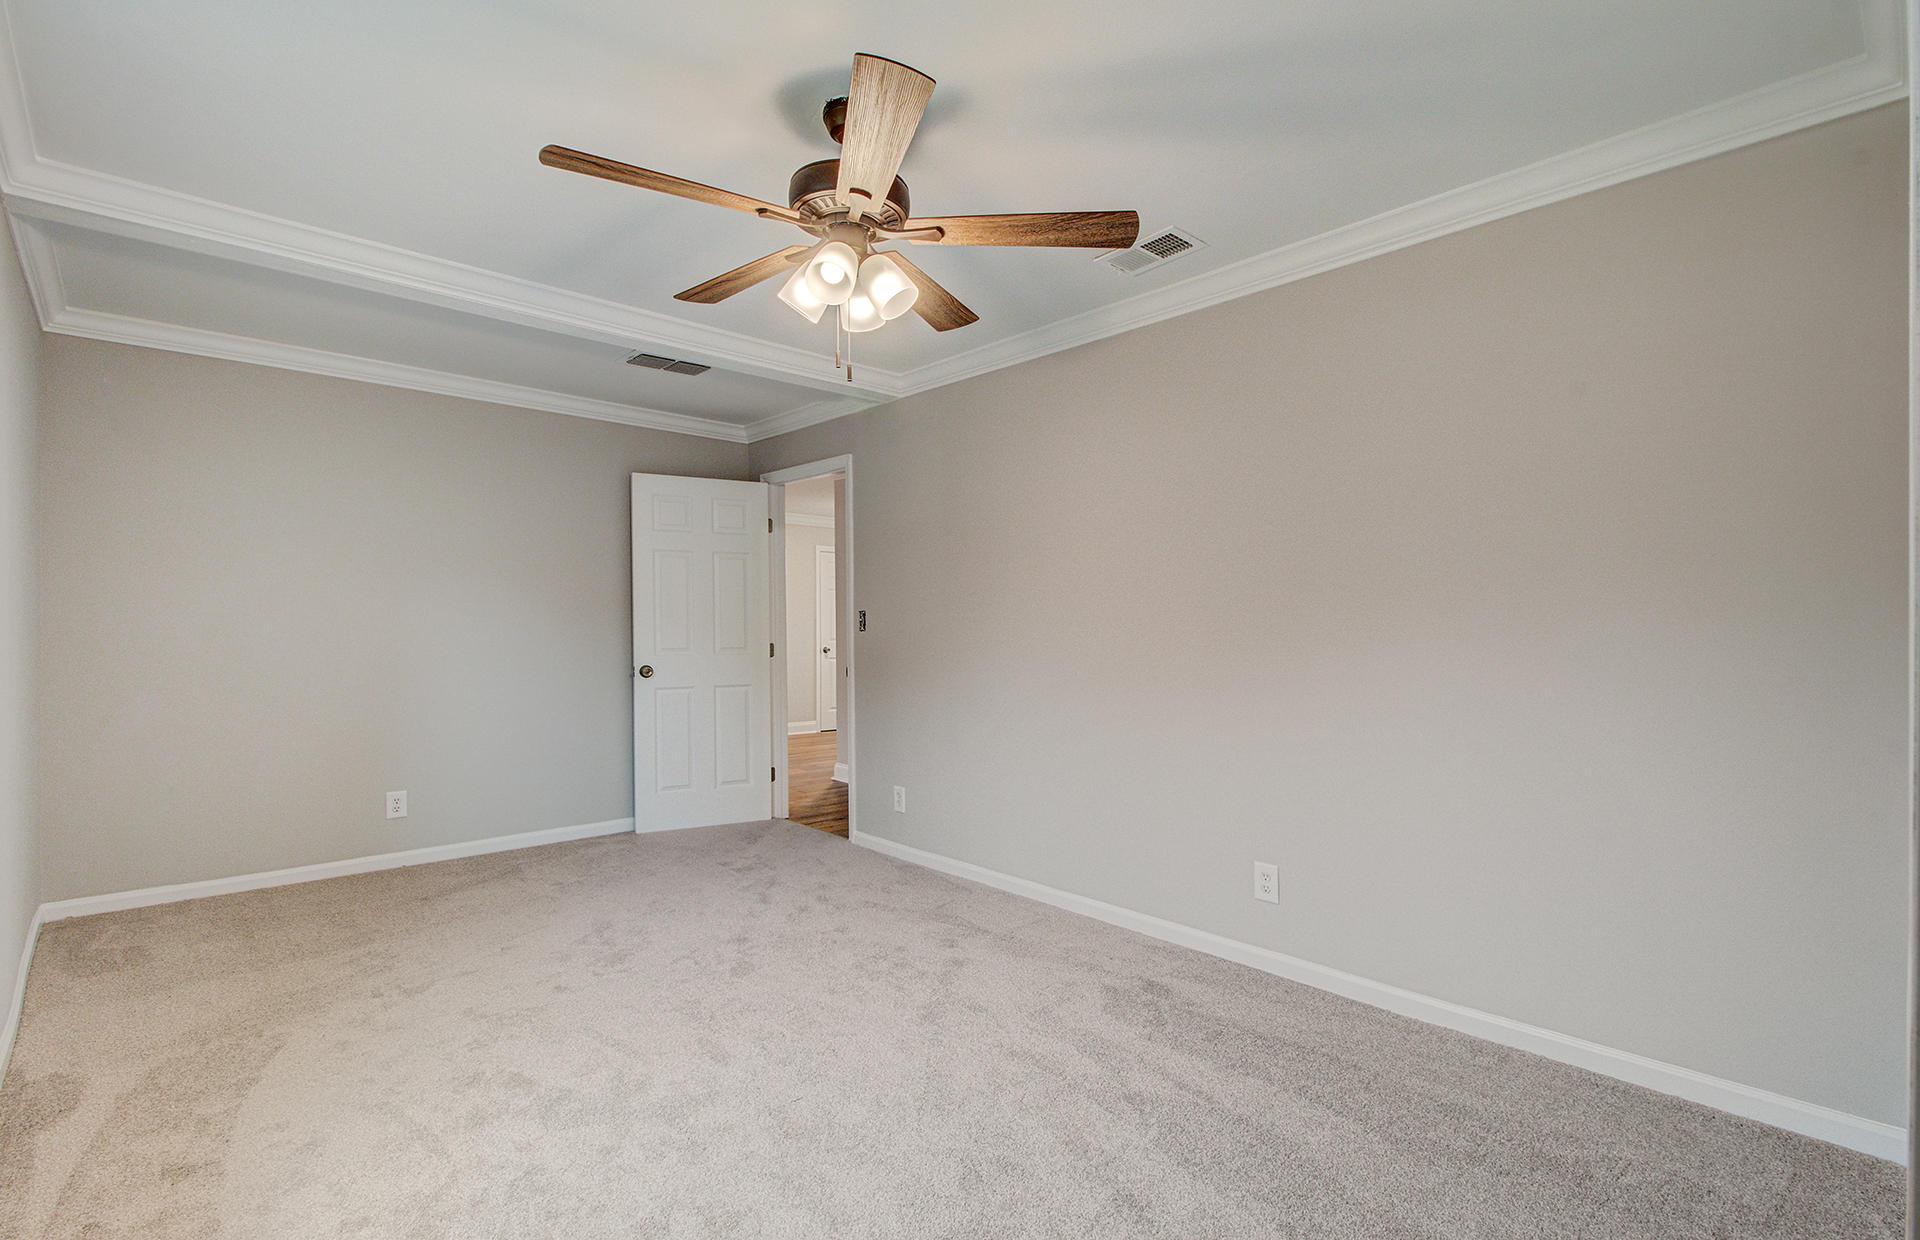 Sedgefield Section I Homes For Sale - 30 Aldene, Goose Creek, SC - 8